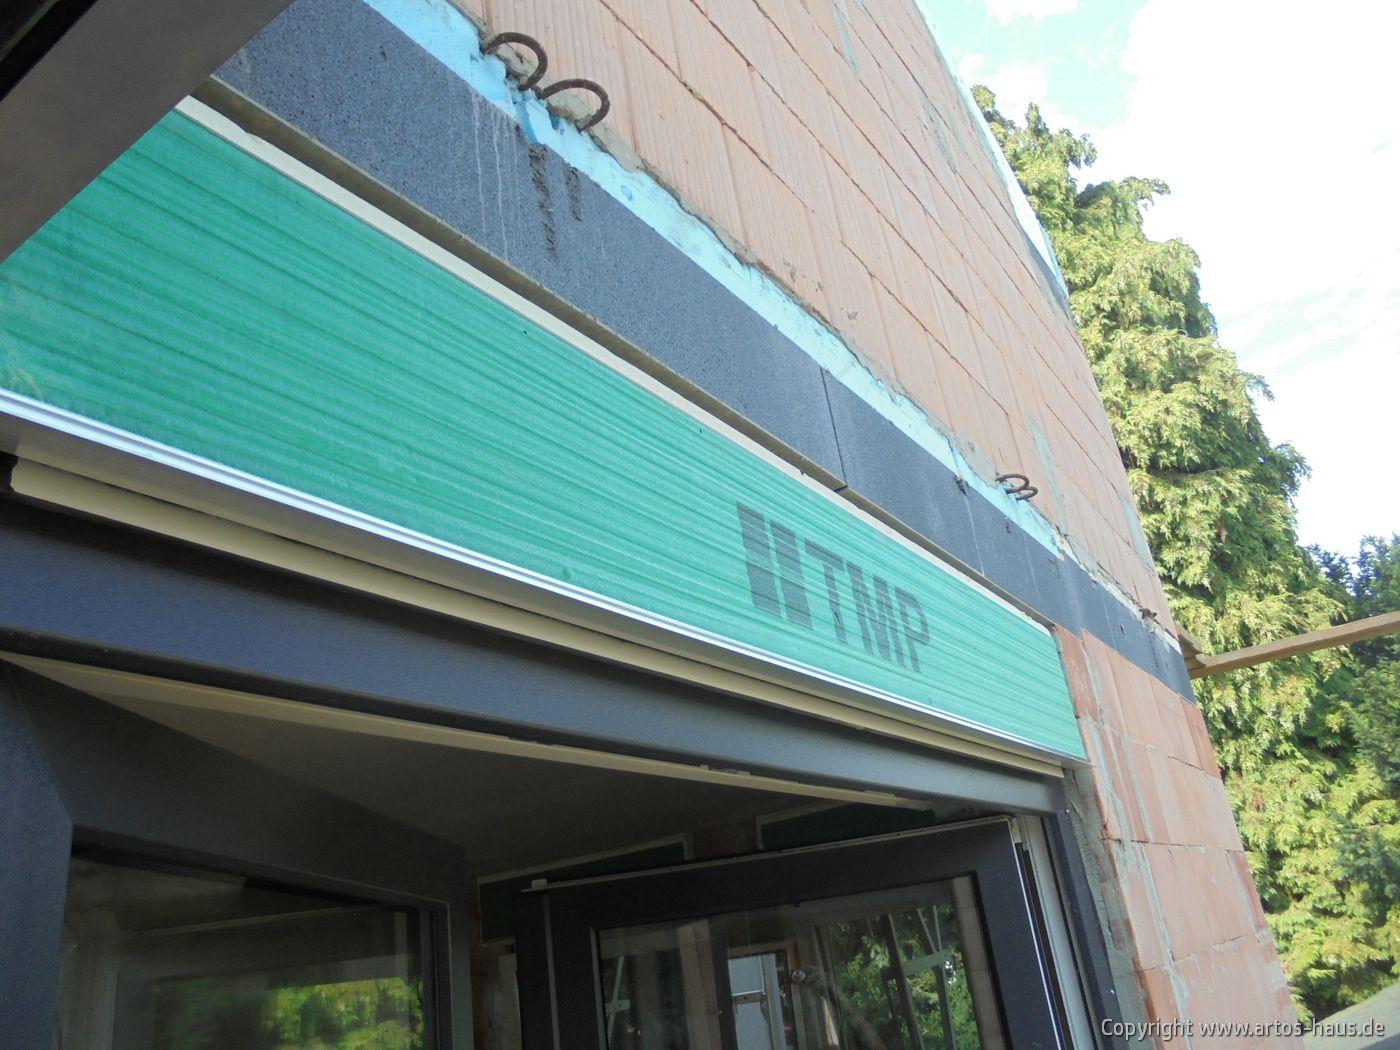 Fenstereinbau MFH Pulheim / ARTOS-HAUS Bild 4